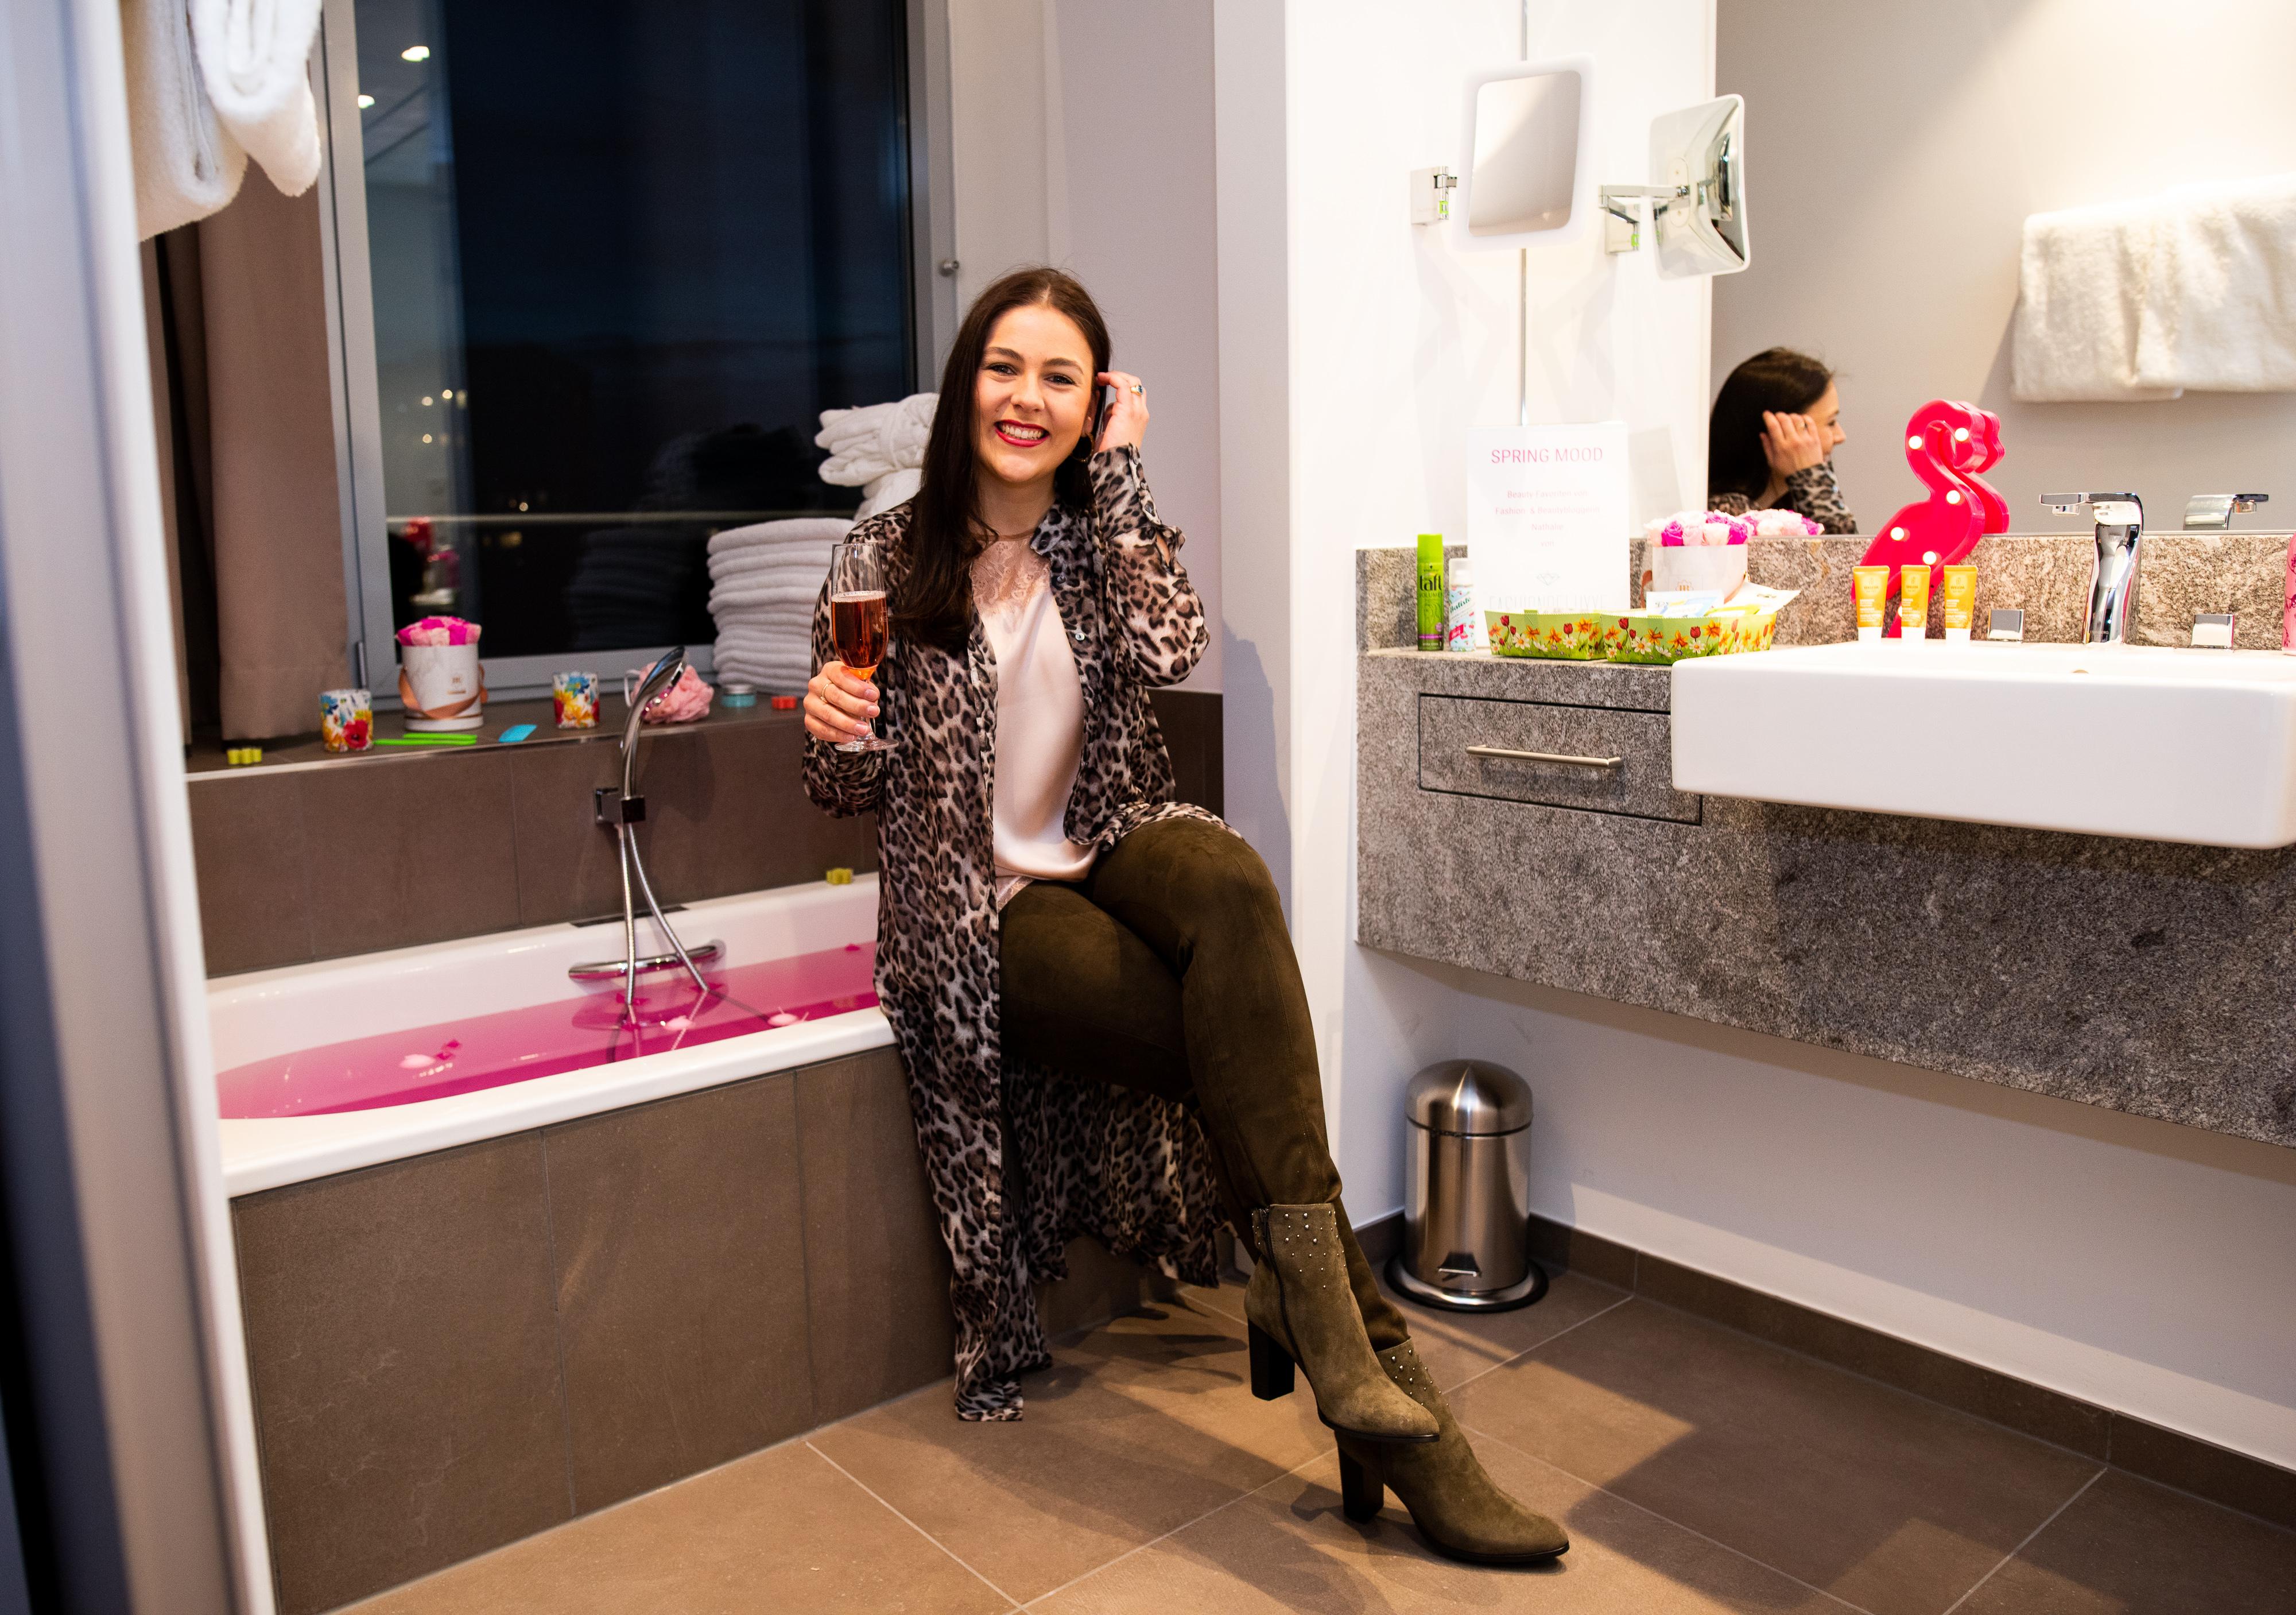 Frühlingshafte Beauty Highlights auf der Fashiondeluxxe Beauty Night - Edition Spring Mood im Steigenberger Hotel München, rosa Badewanne